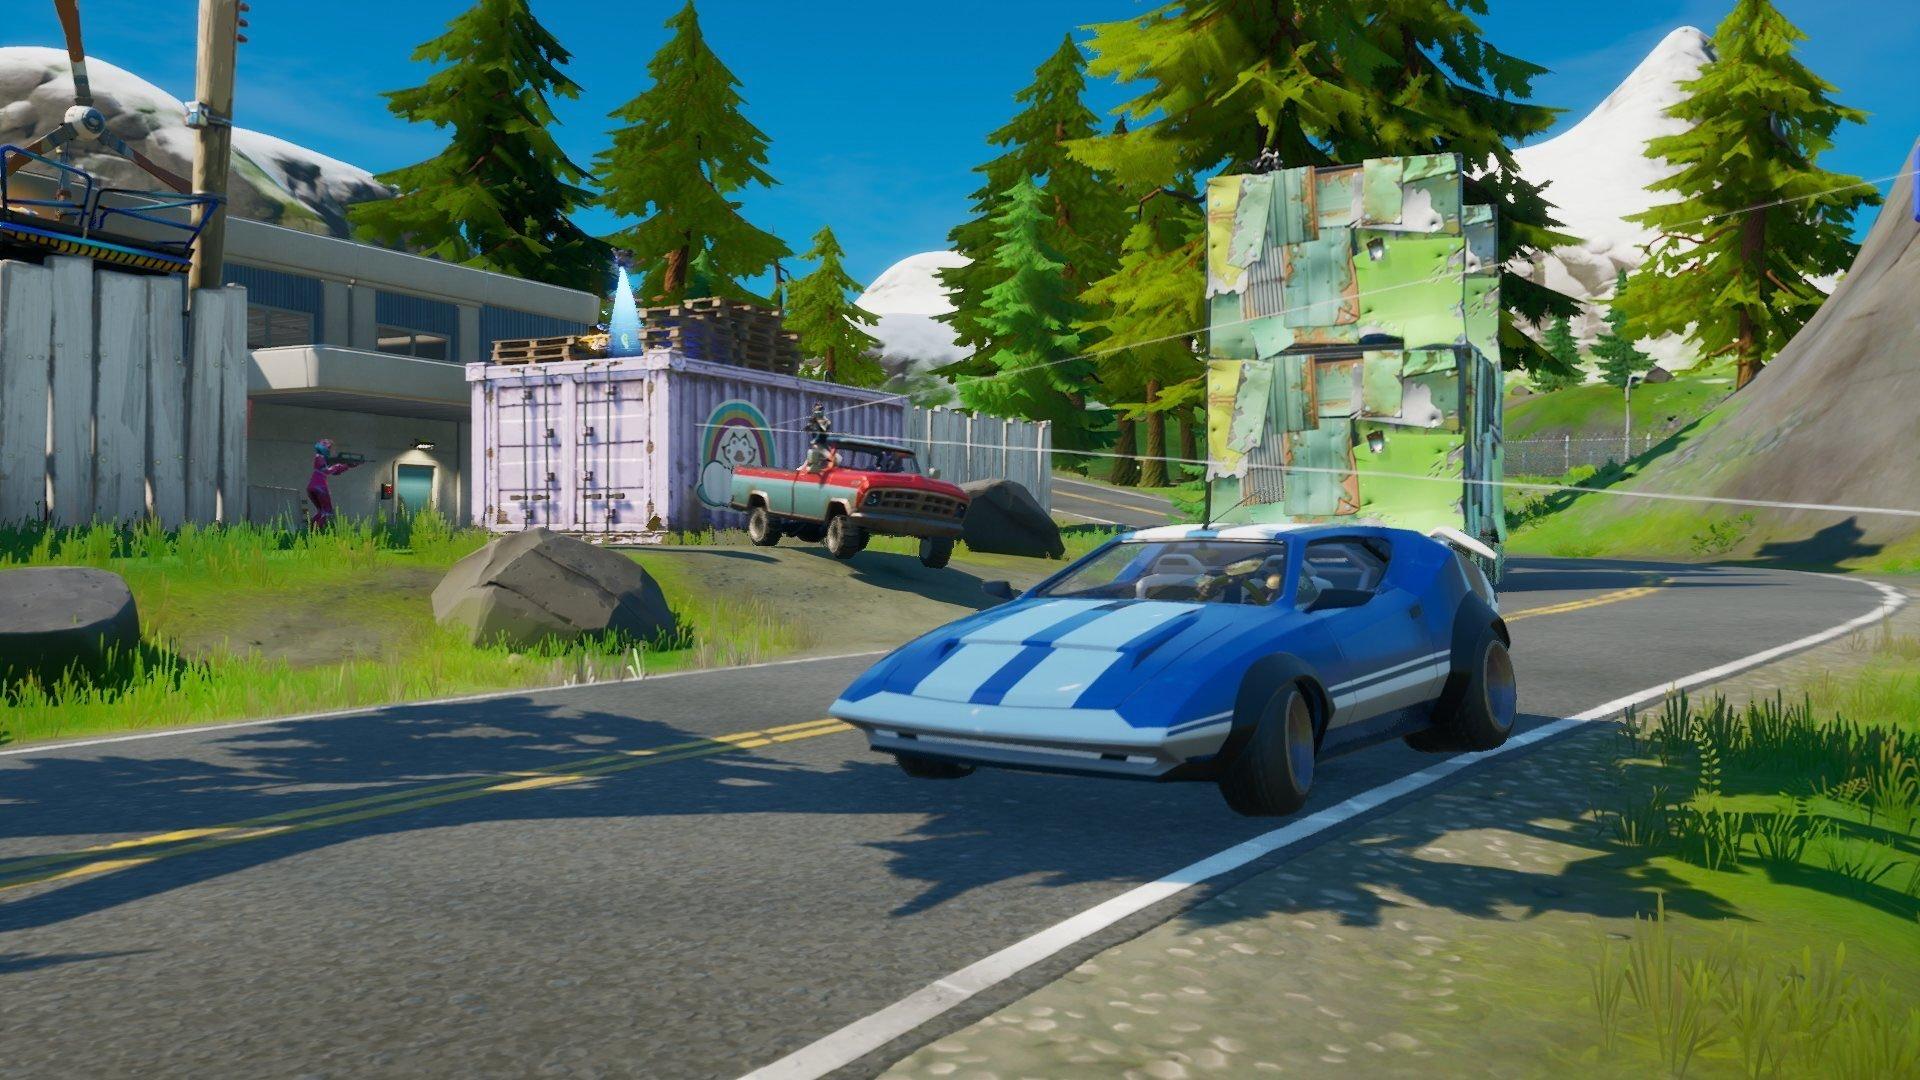 Can You Drive Cars In Fortnite Dot Esports